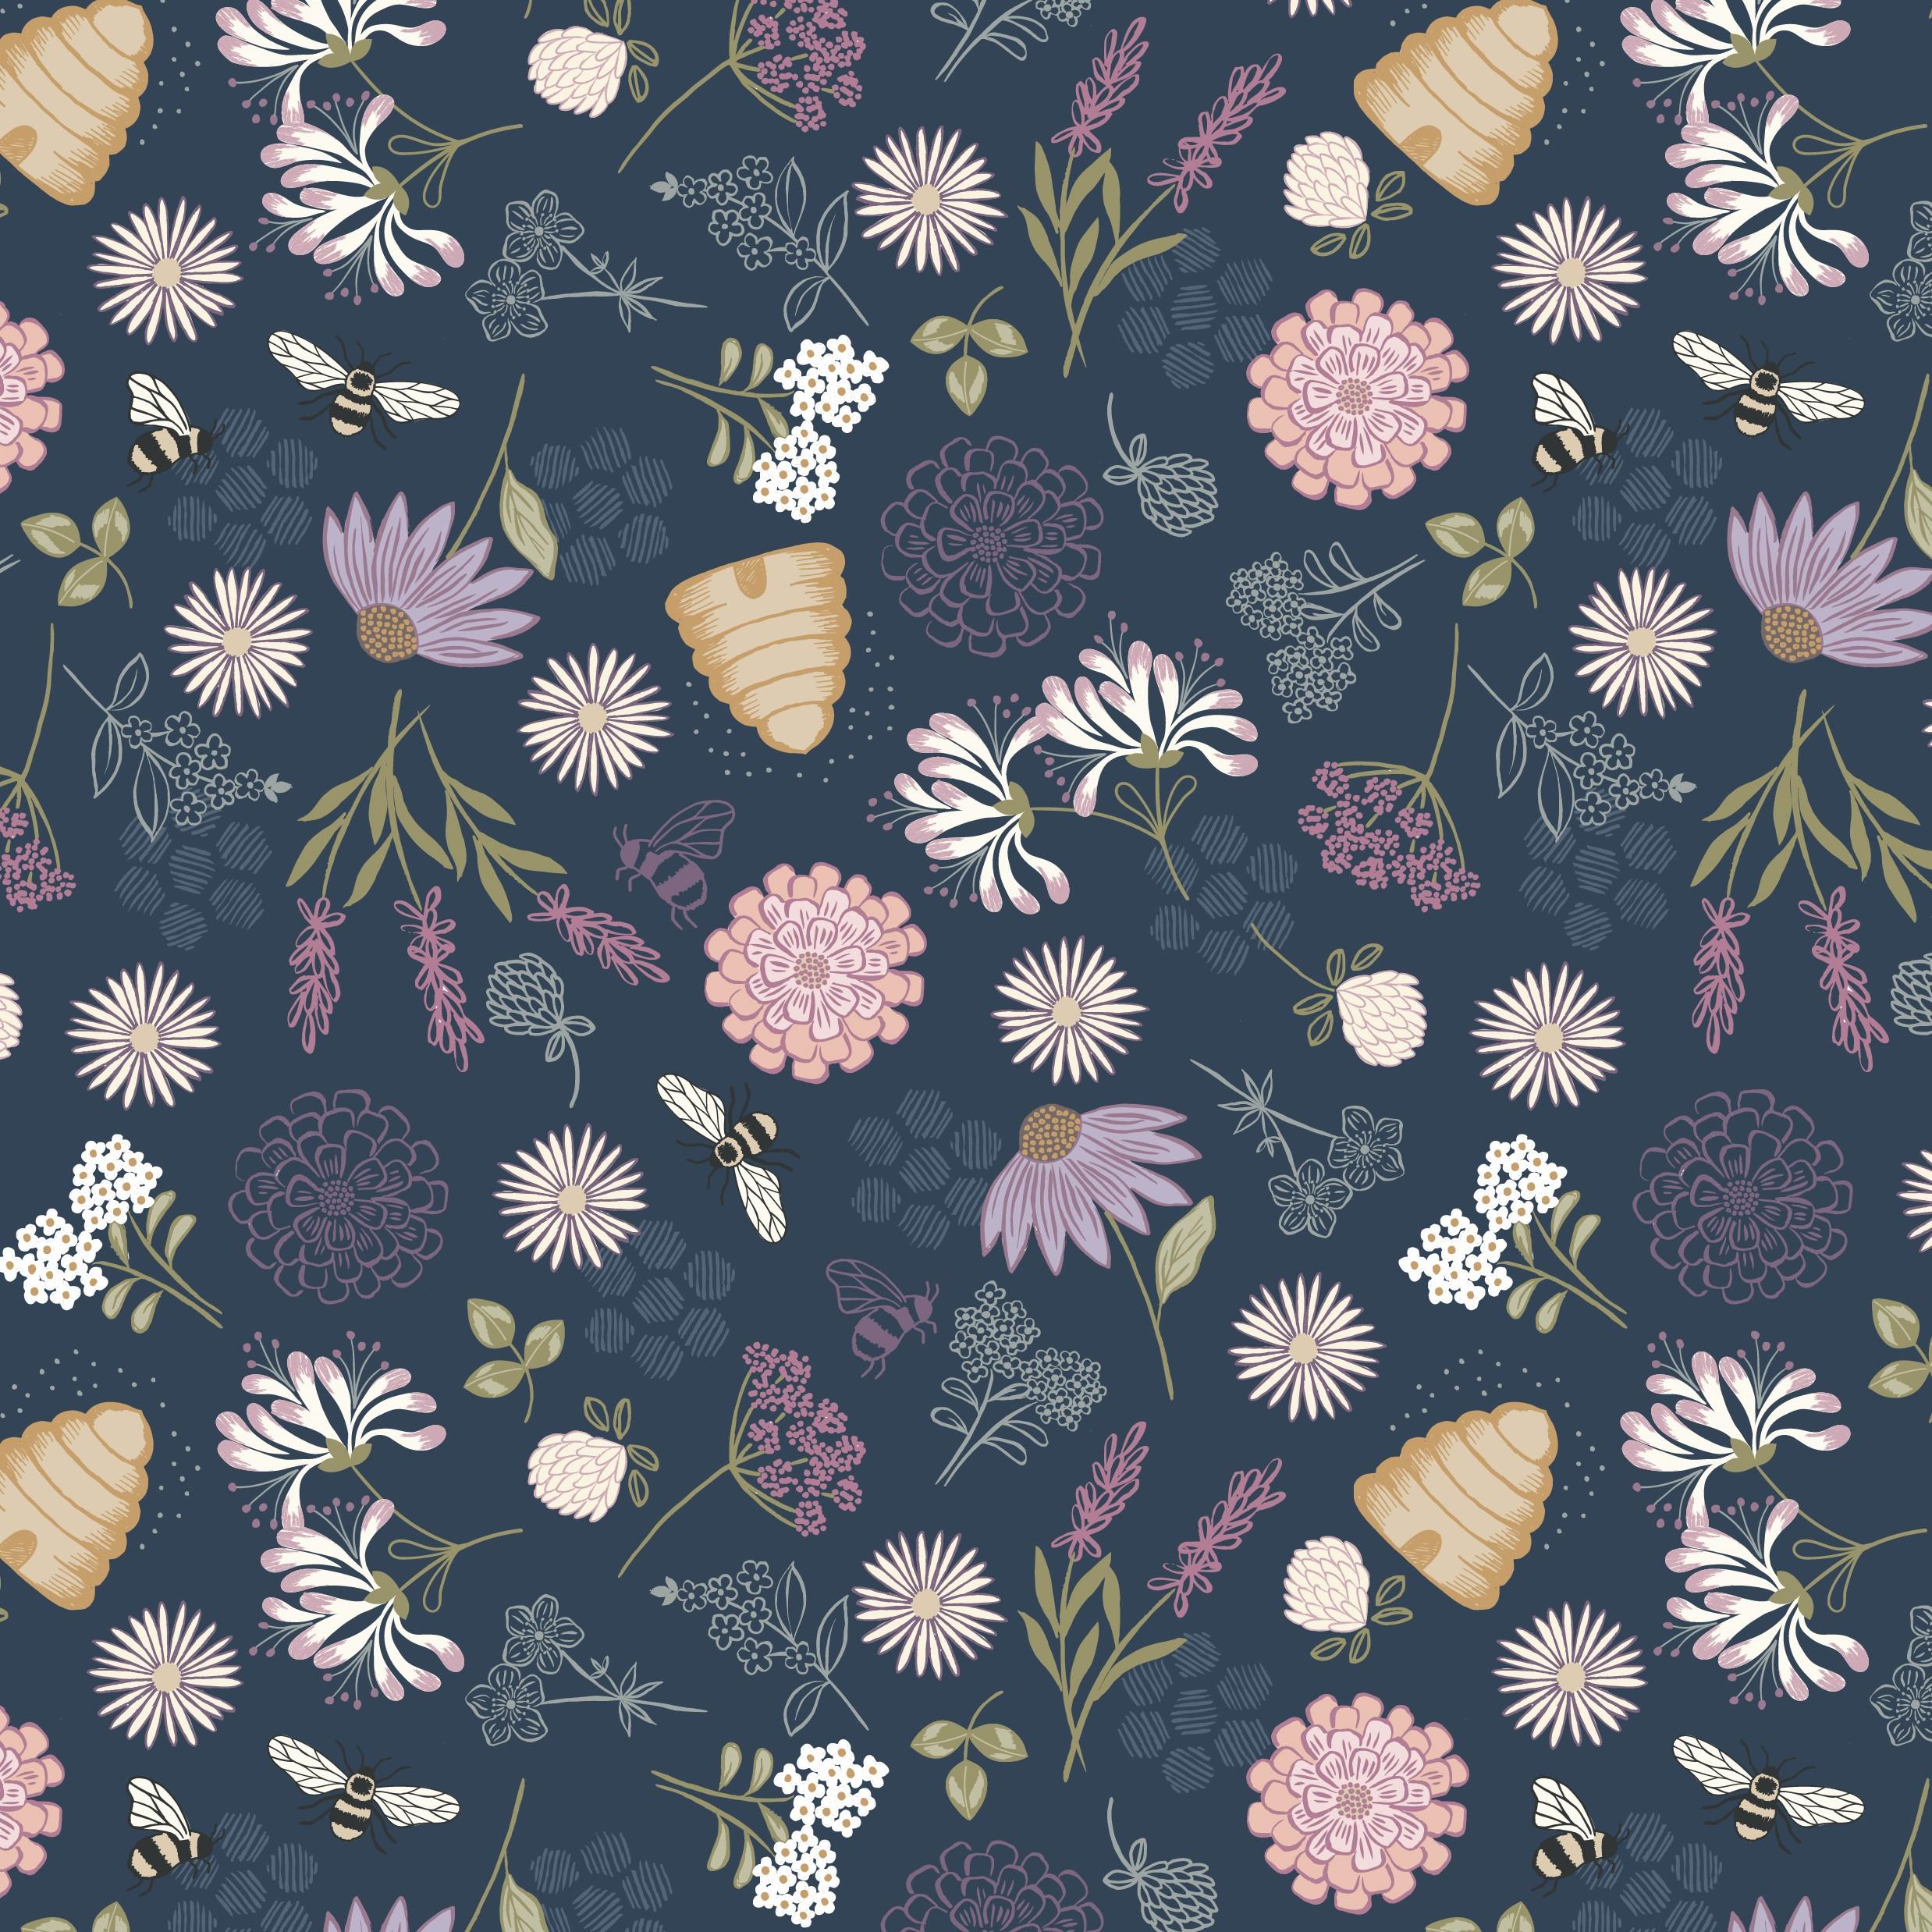 Queen Bee Floral Navy craft Fabric